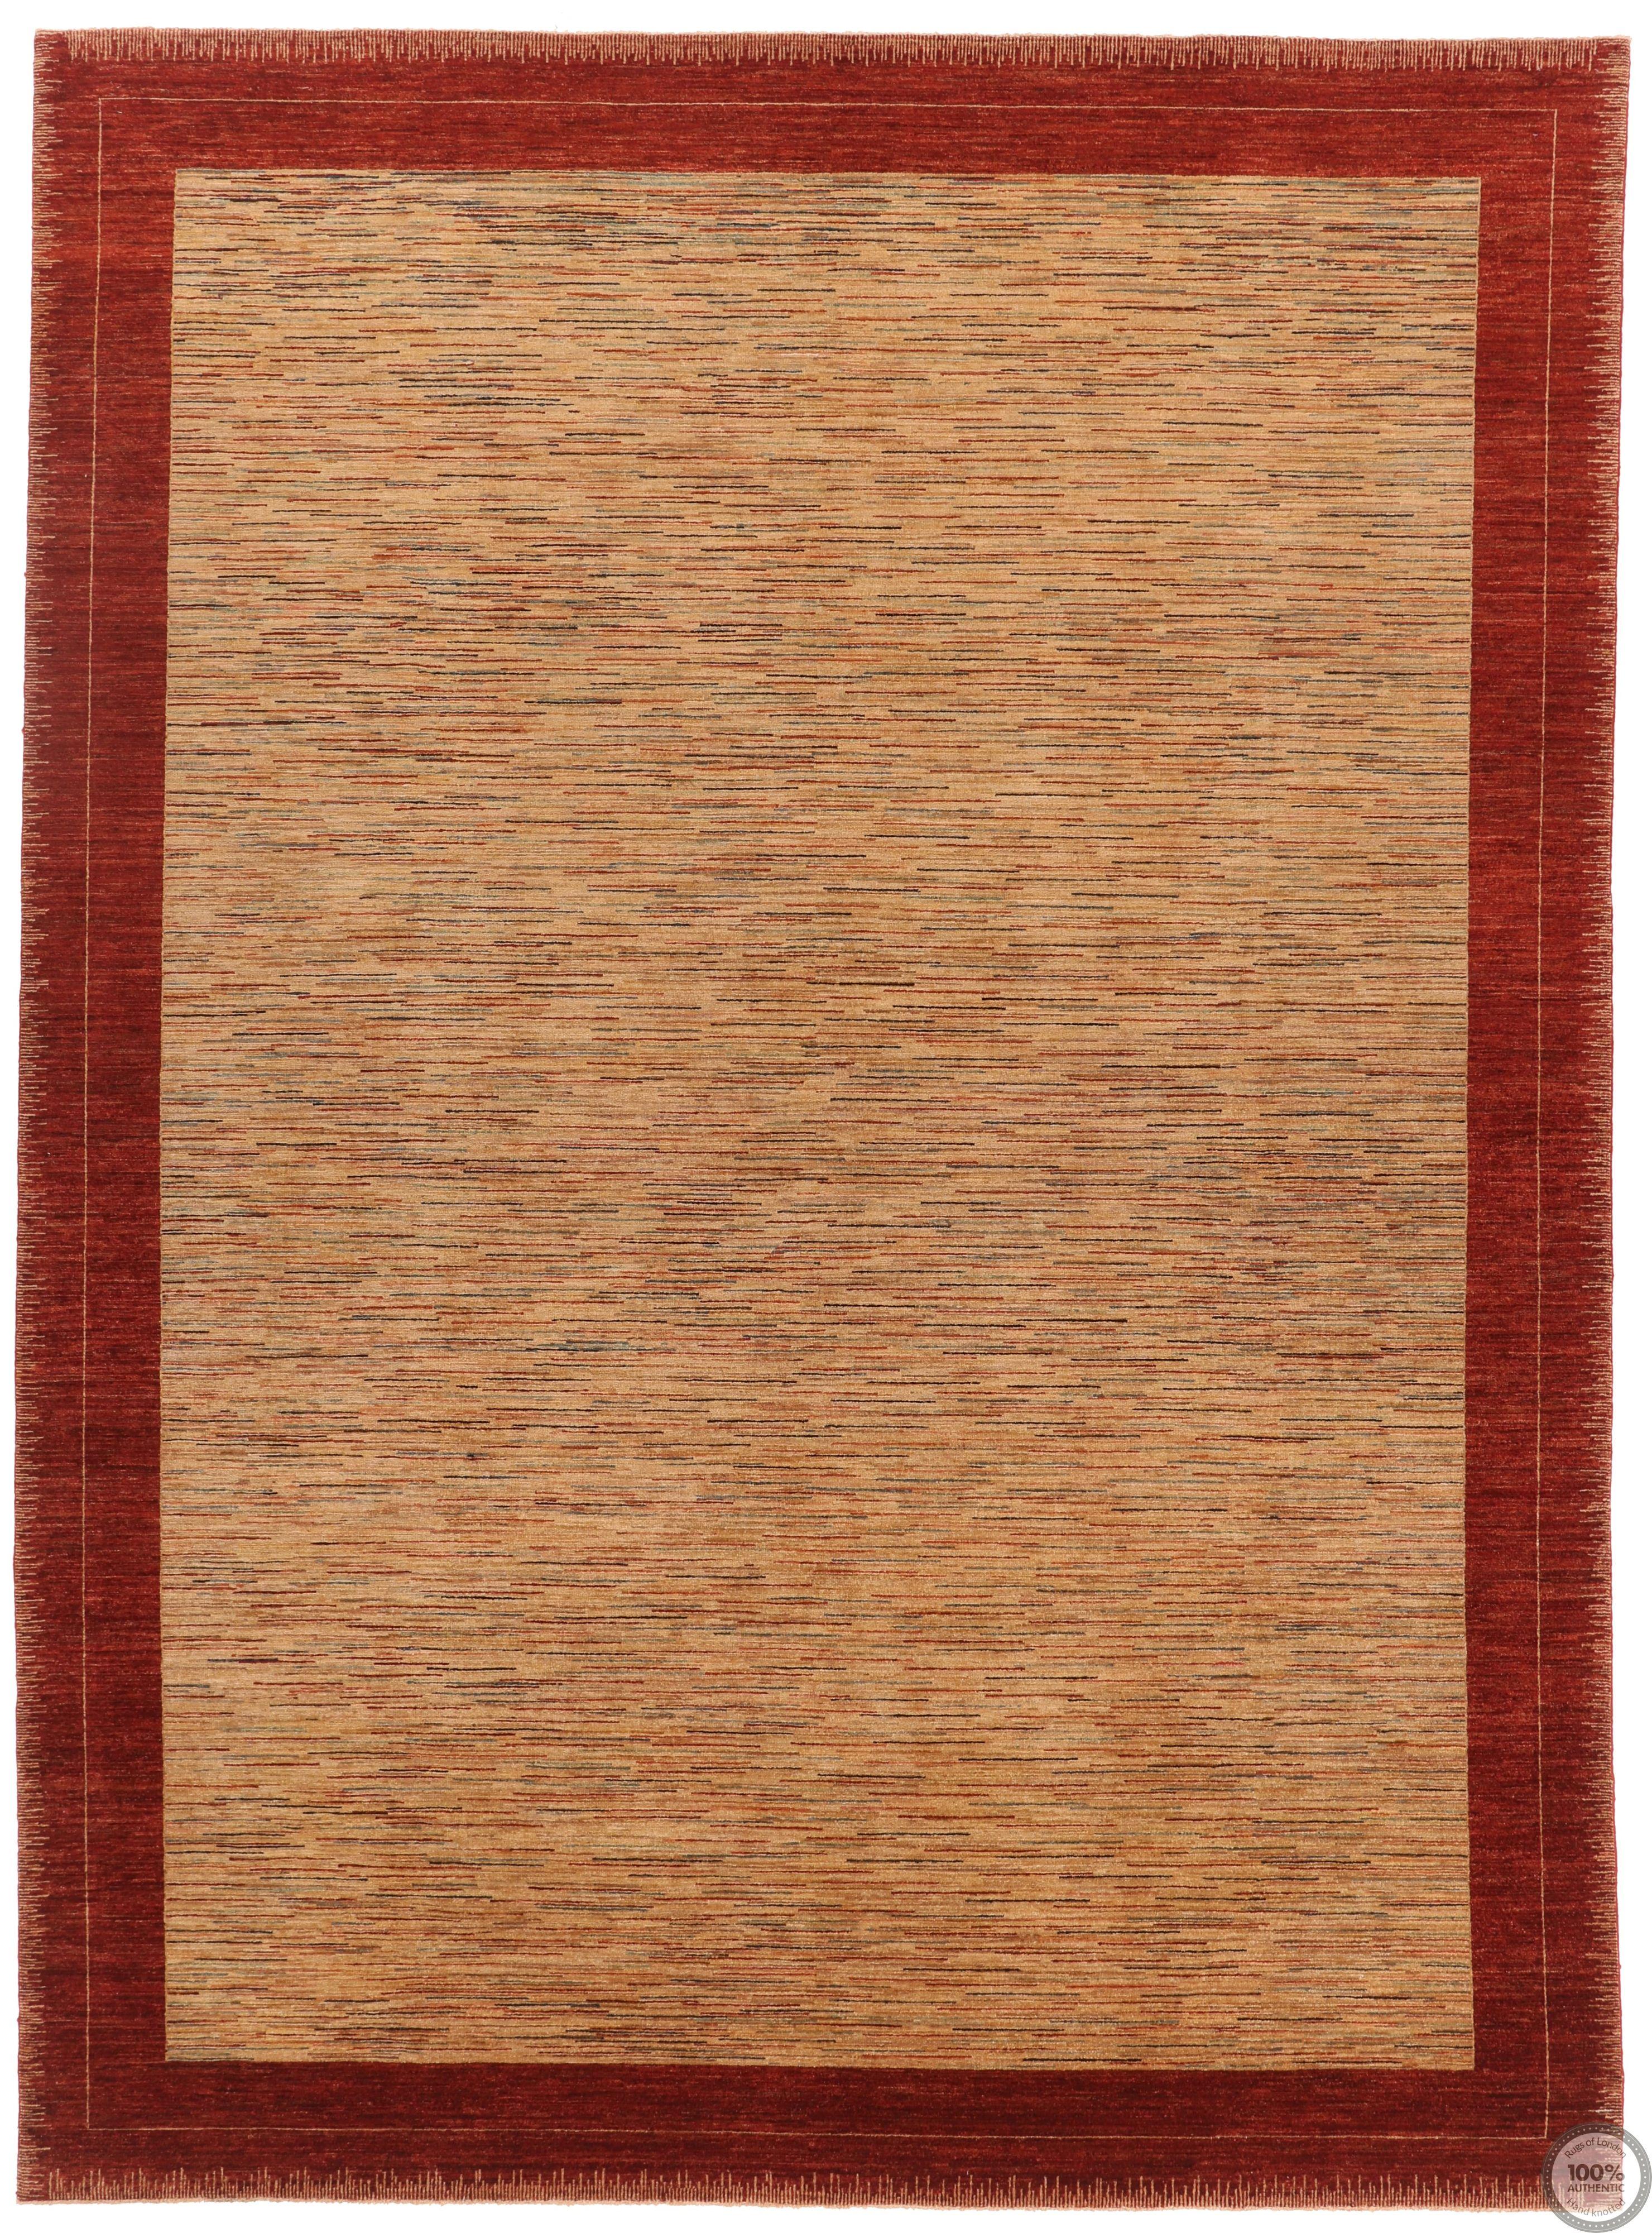 Garous Modern / Ziegler Design Rug - Mix Beige Background / Red Borders - front view